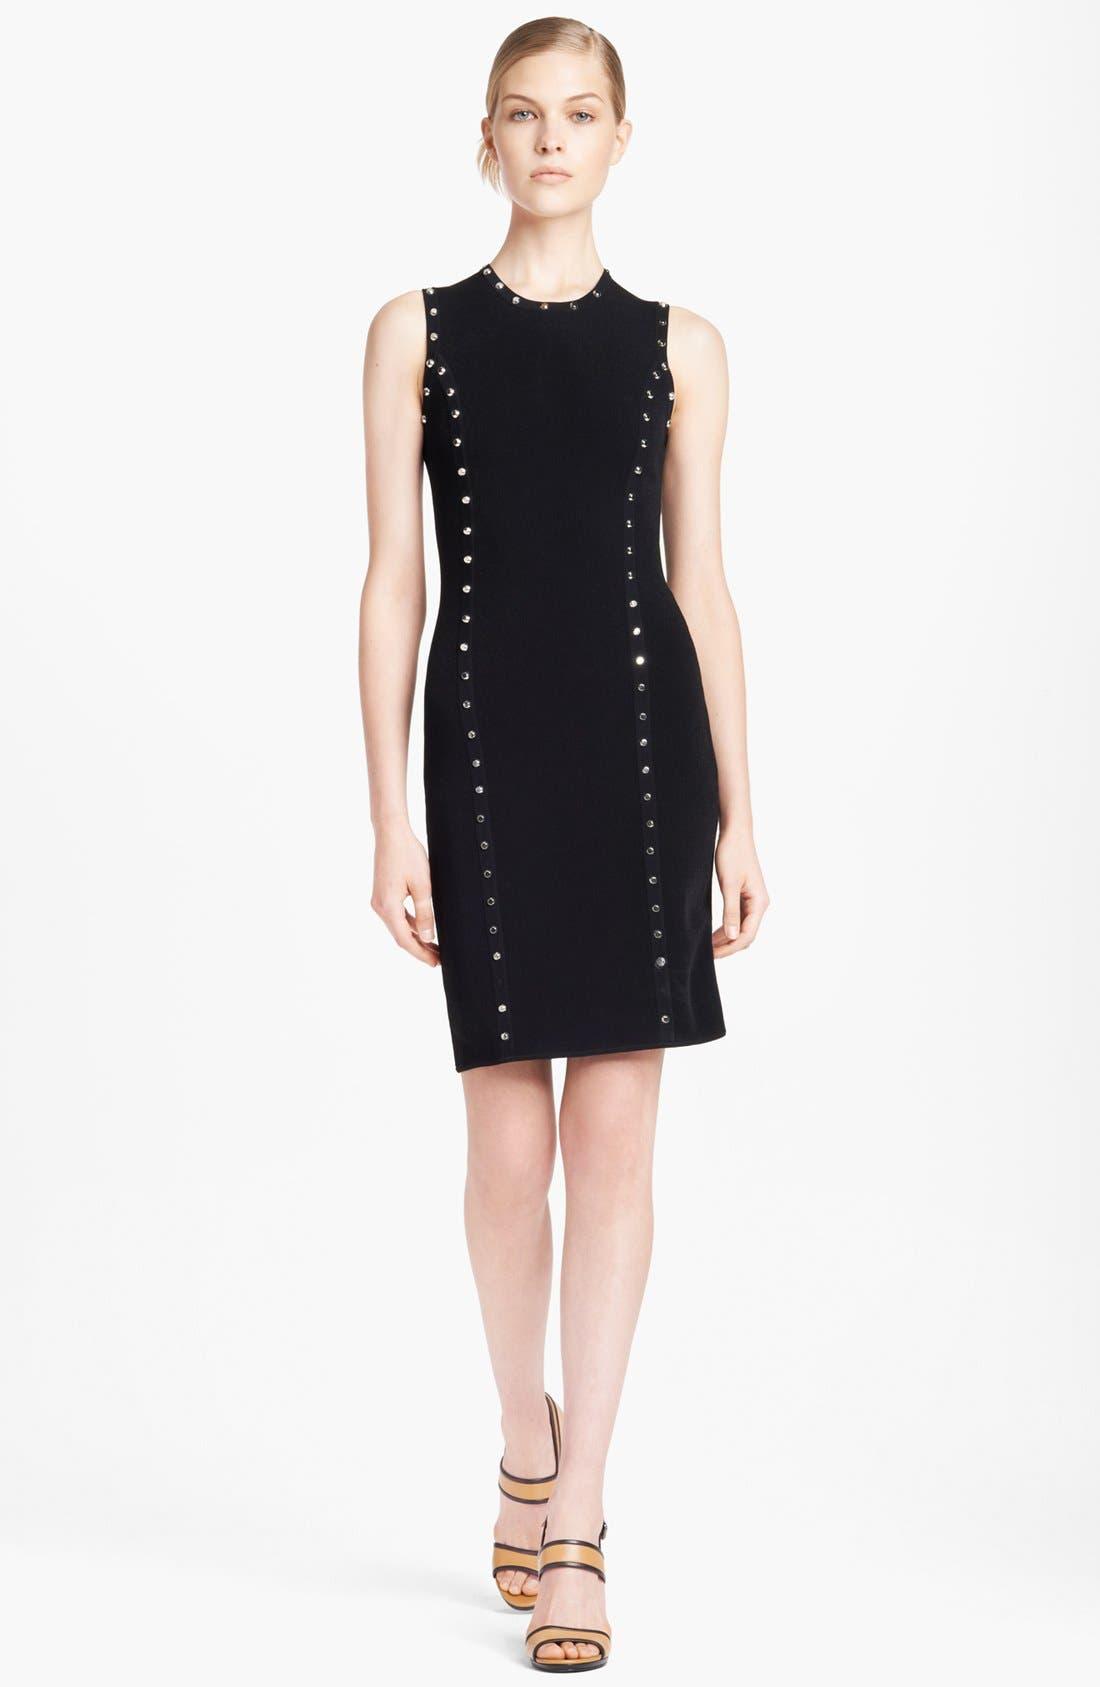 Main Image - Michael Kors Studded Knit Dress